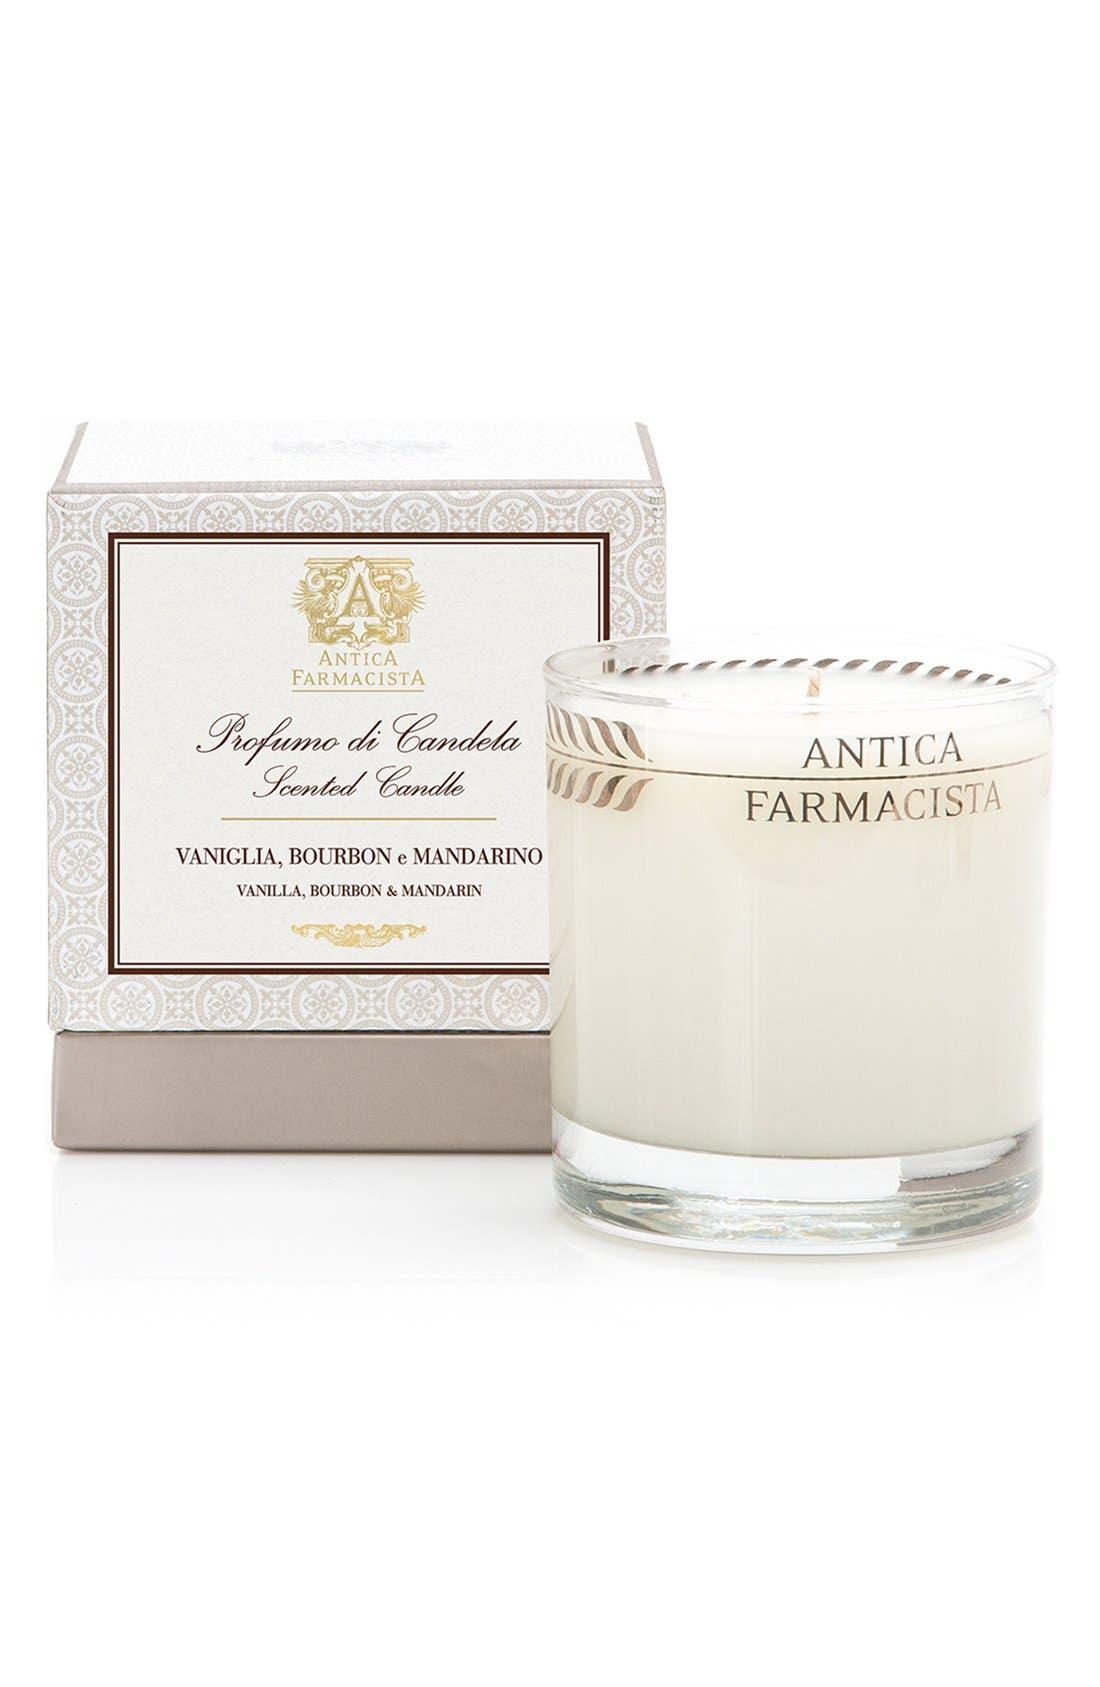 Antica Farmacista 'Vanilla, Bourbon & Mandarin' Candle